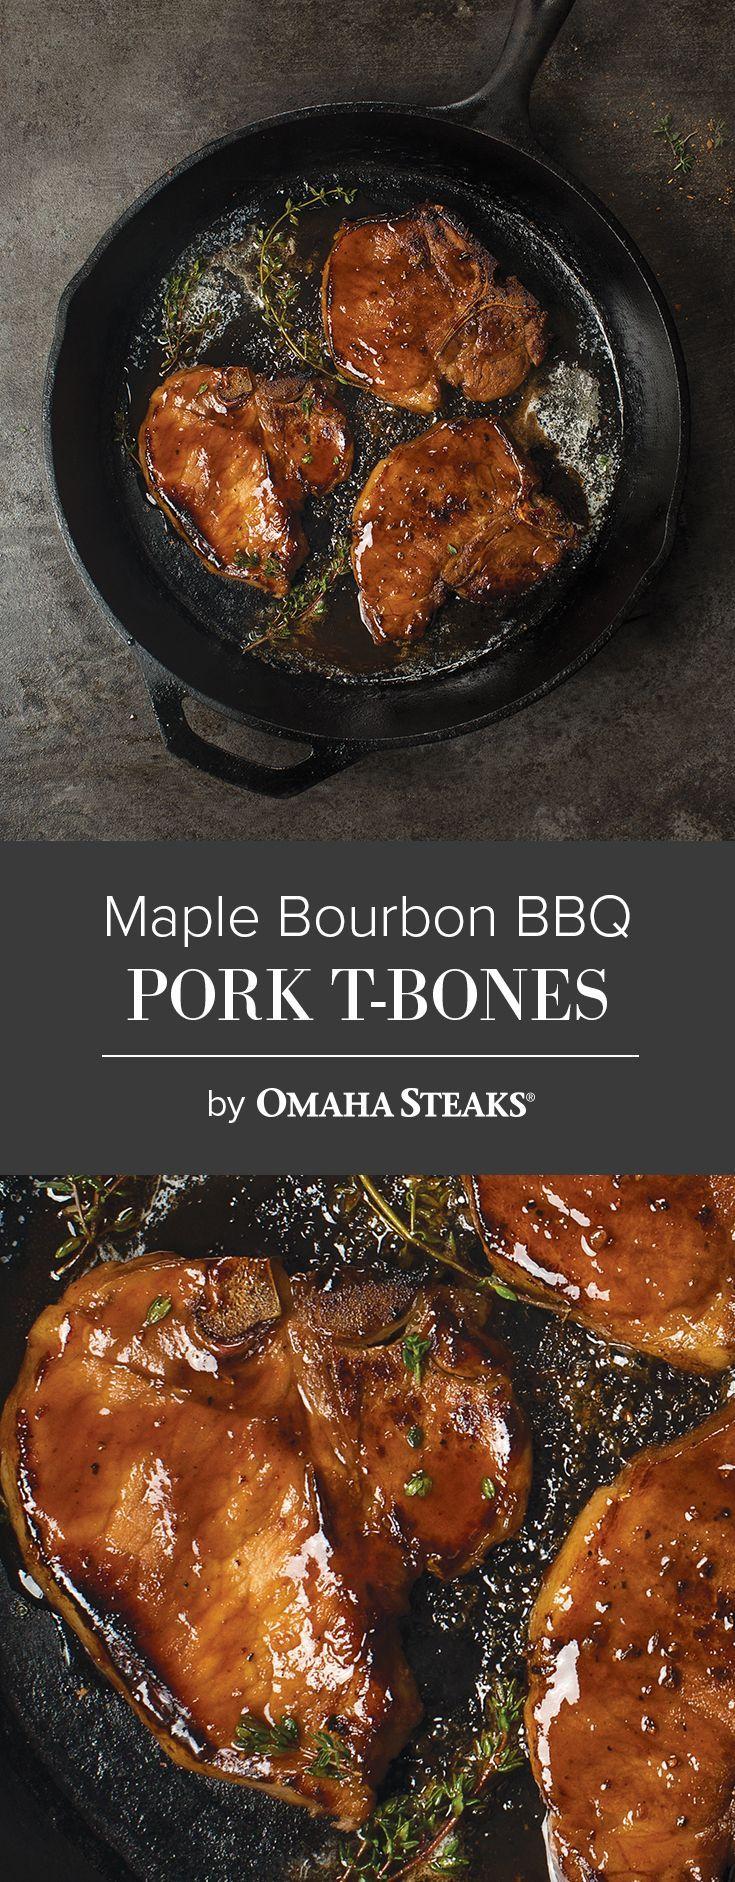 Maple Bourbon Pork T-Bones